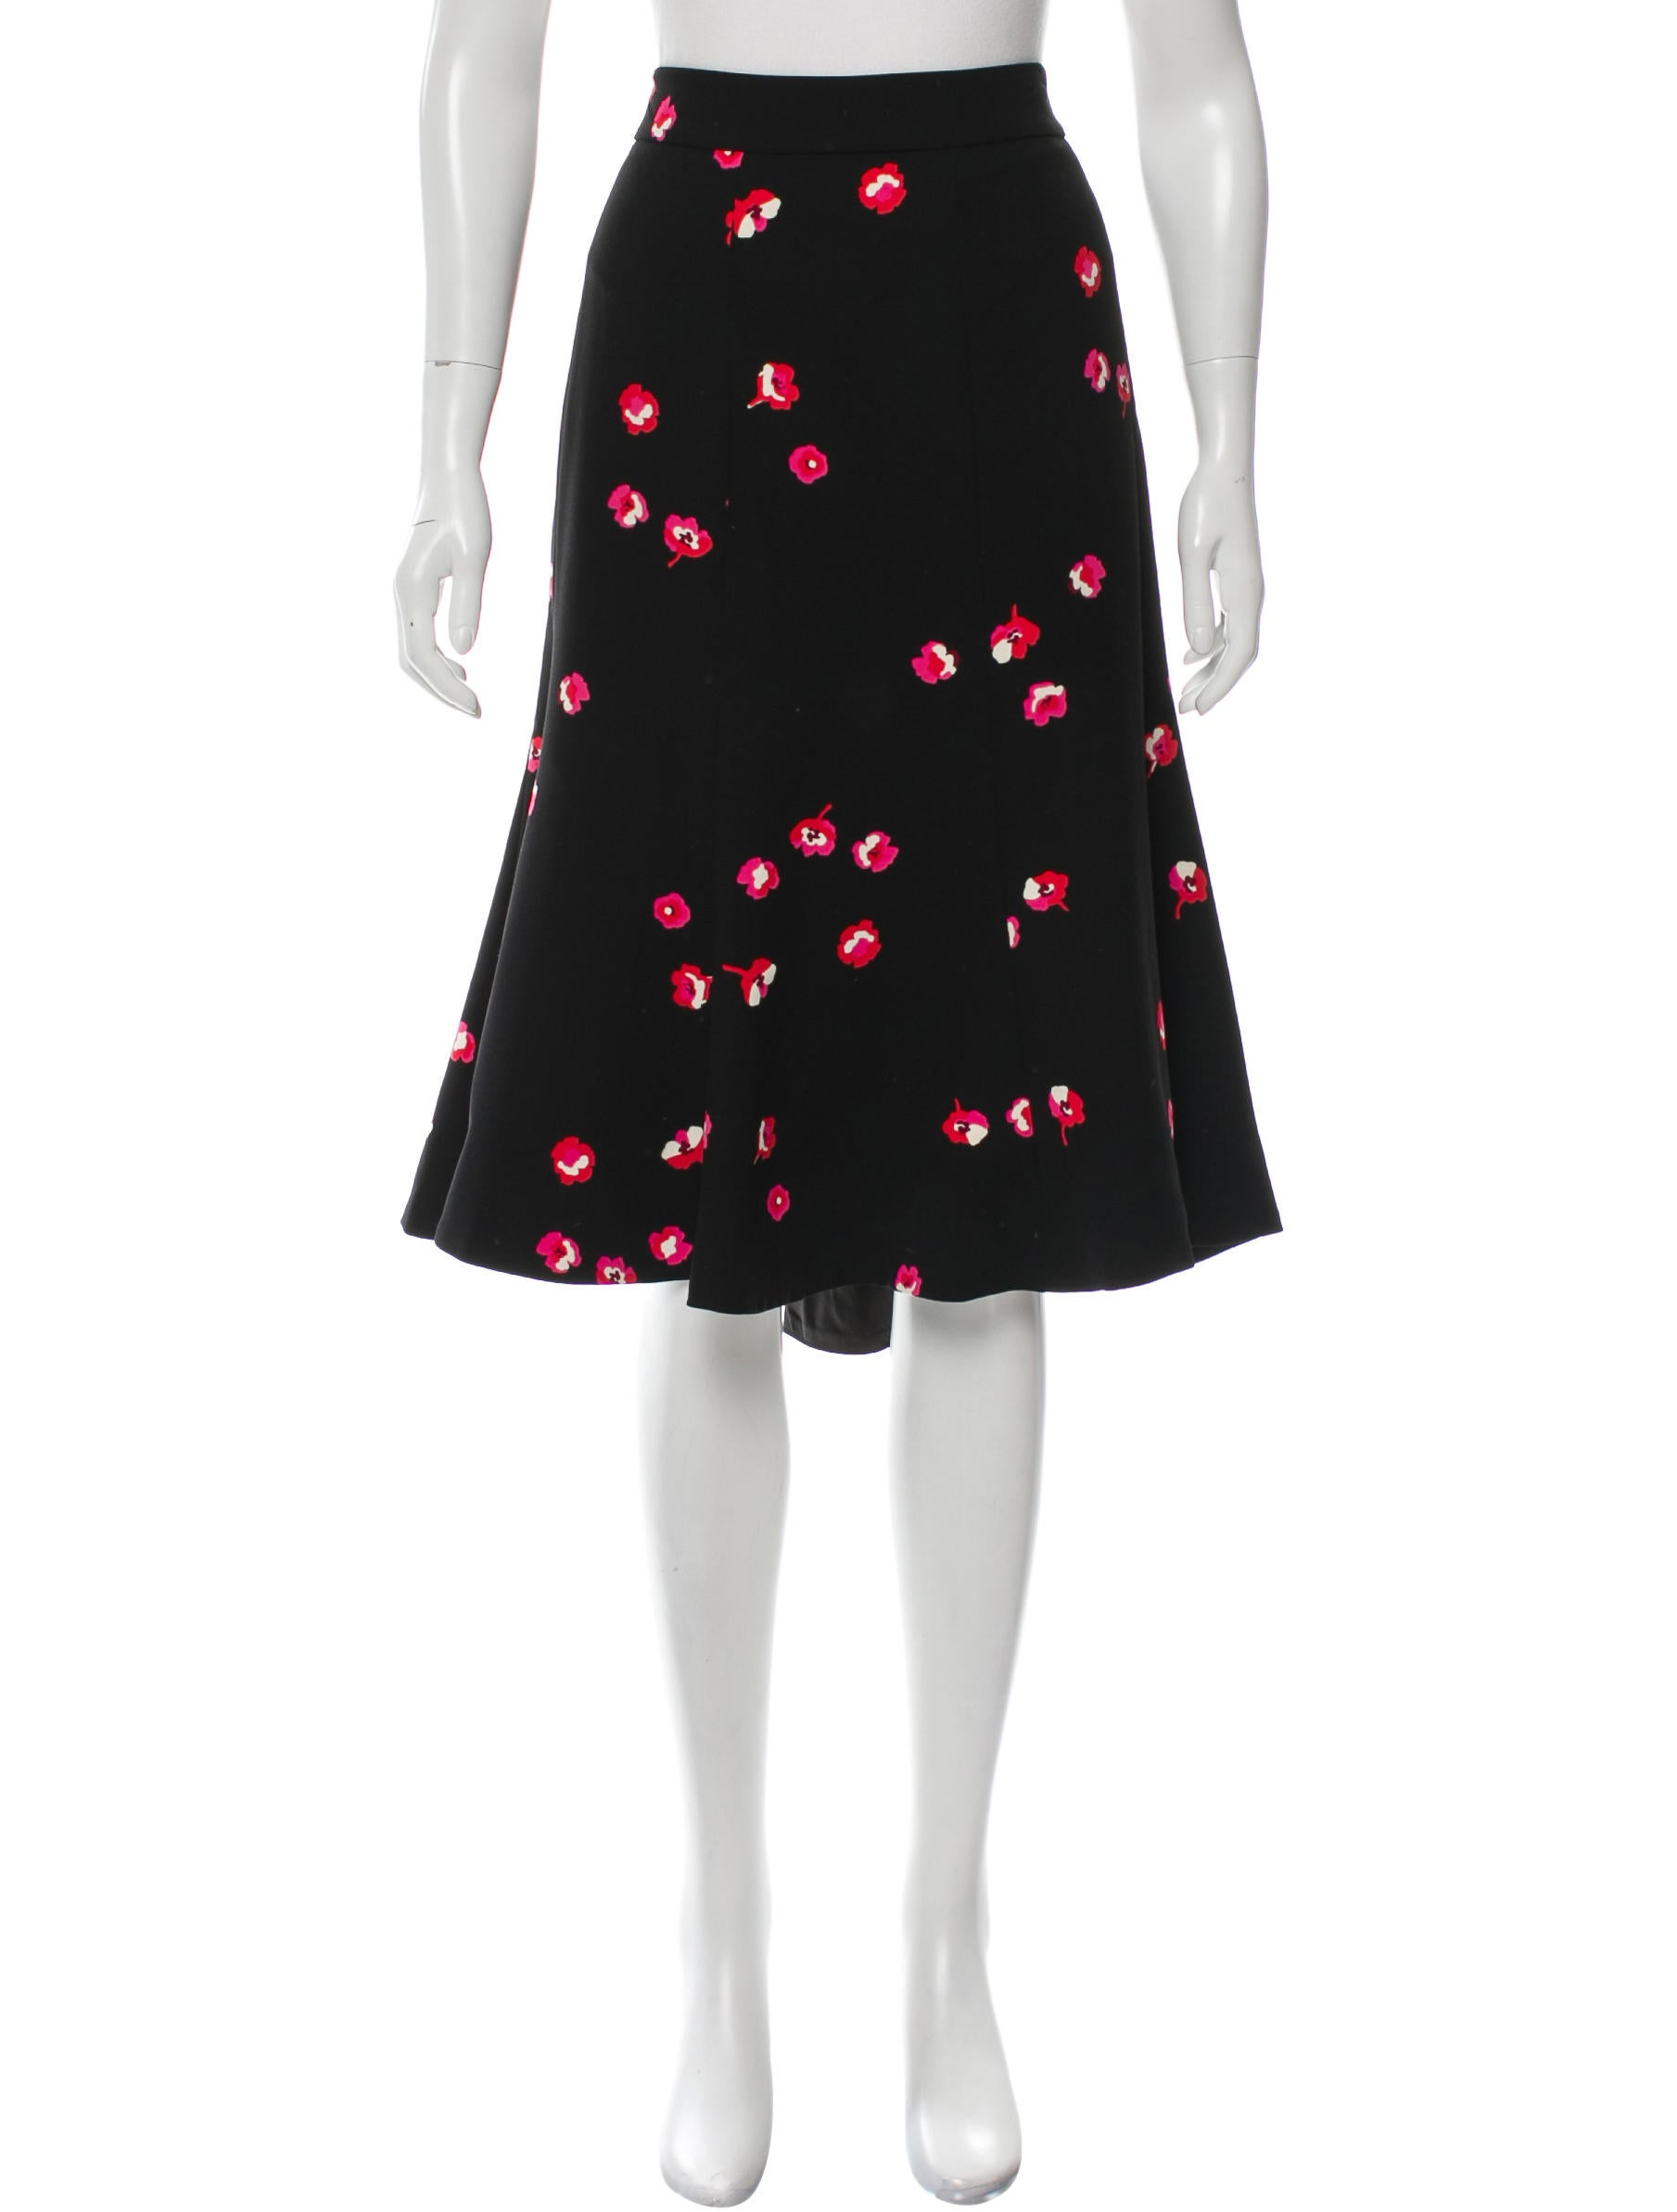 kate spade new york floral print knee length skirt